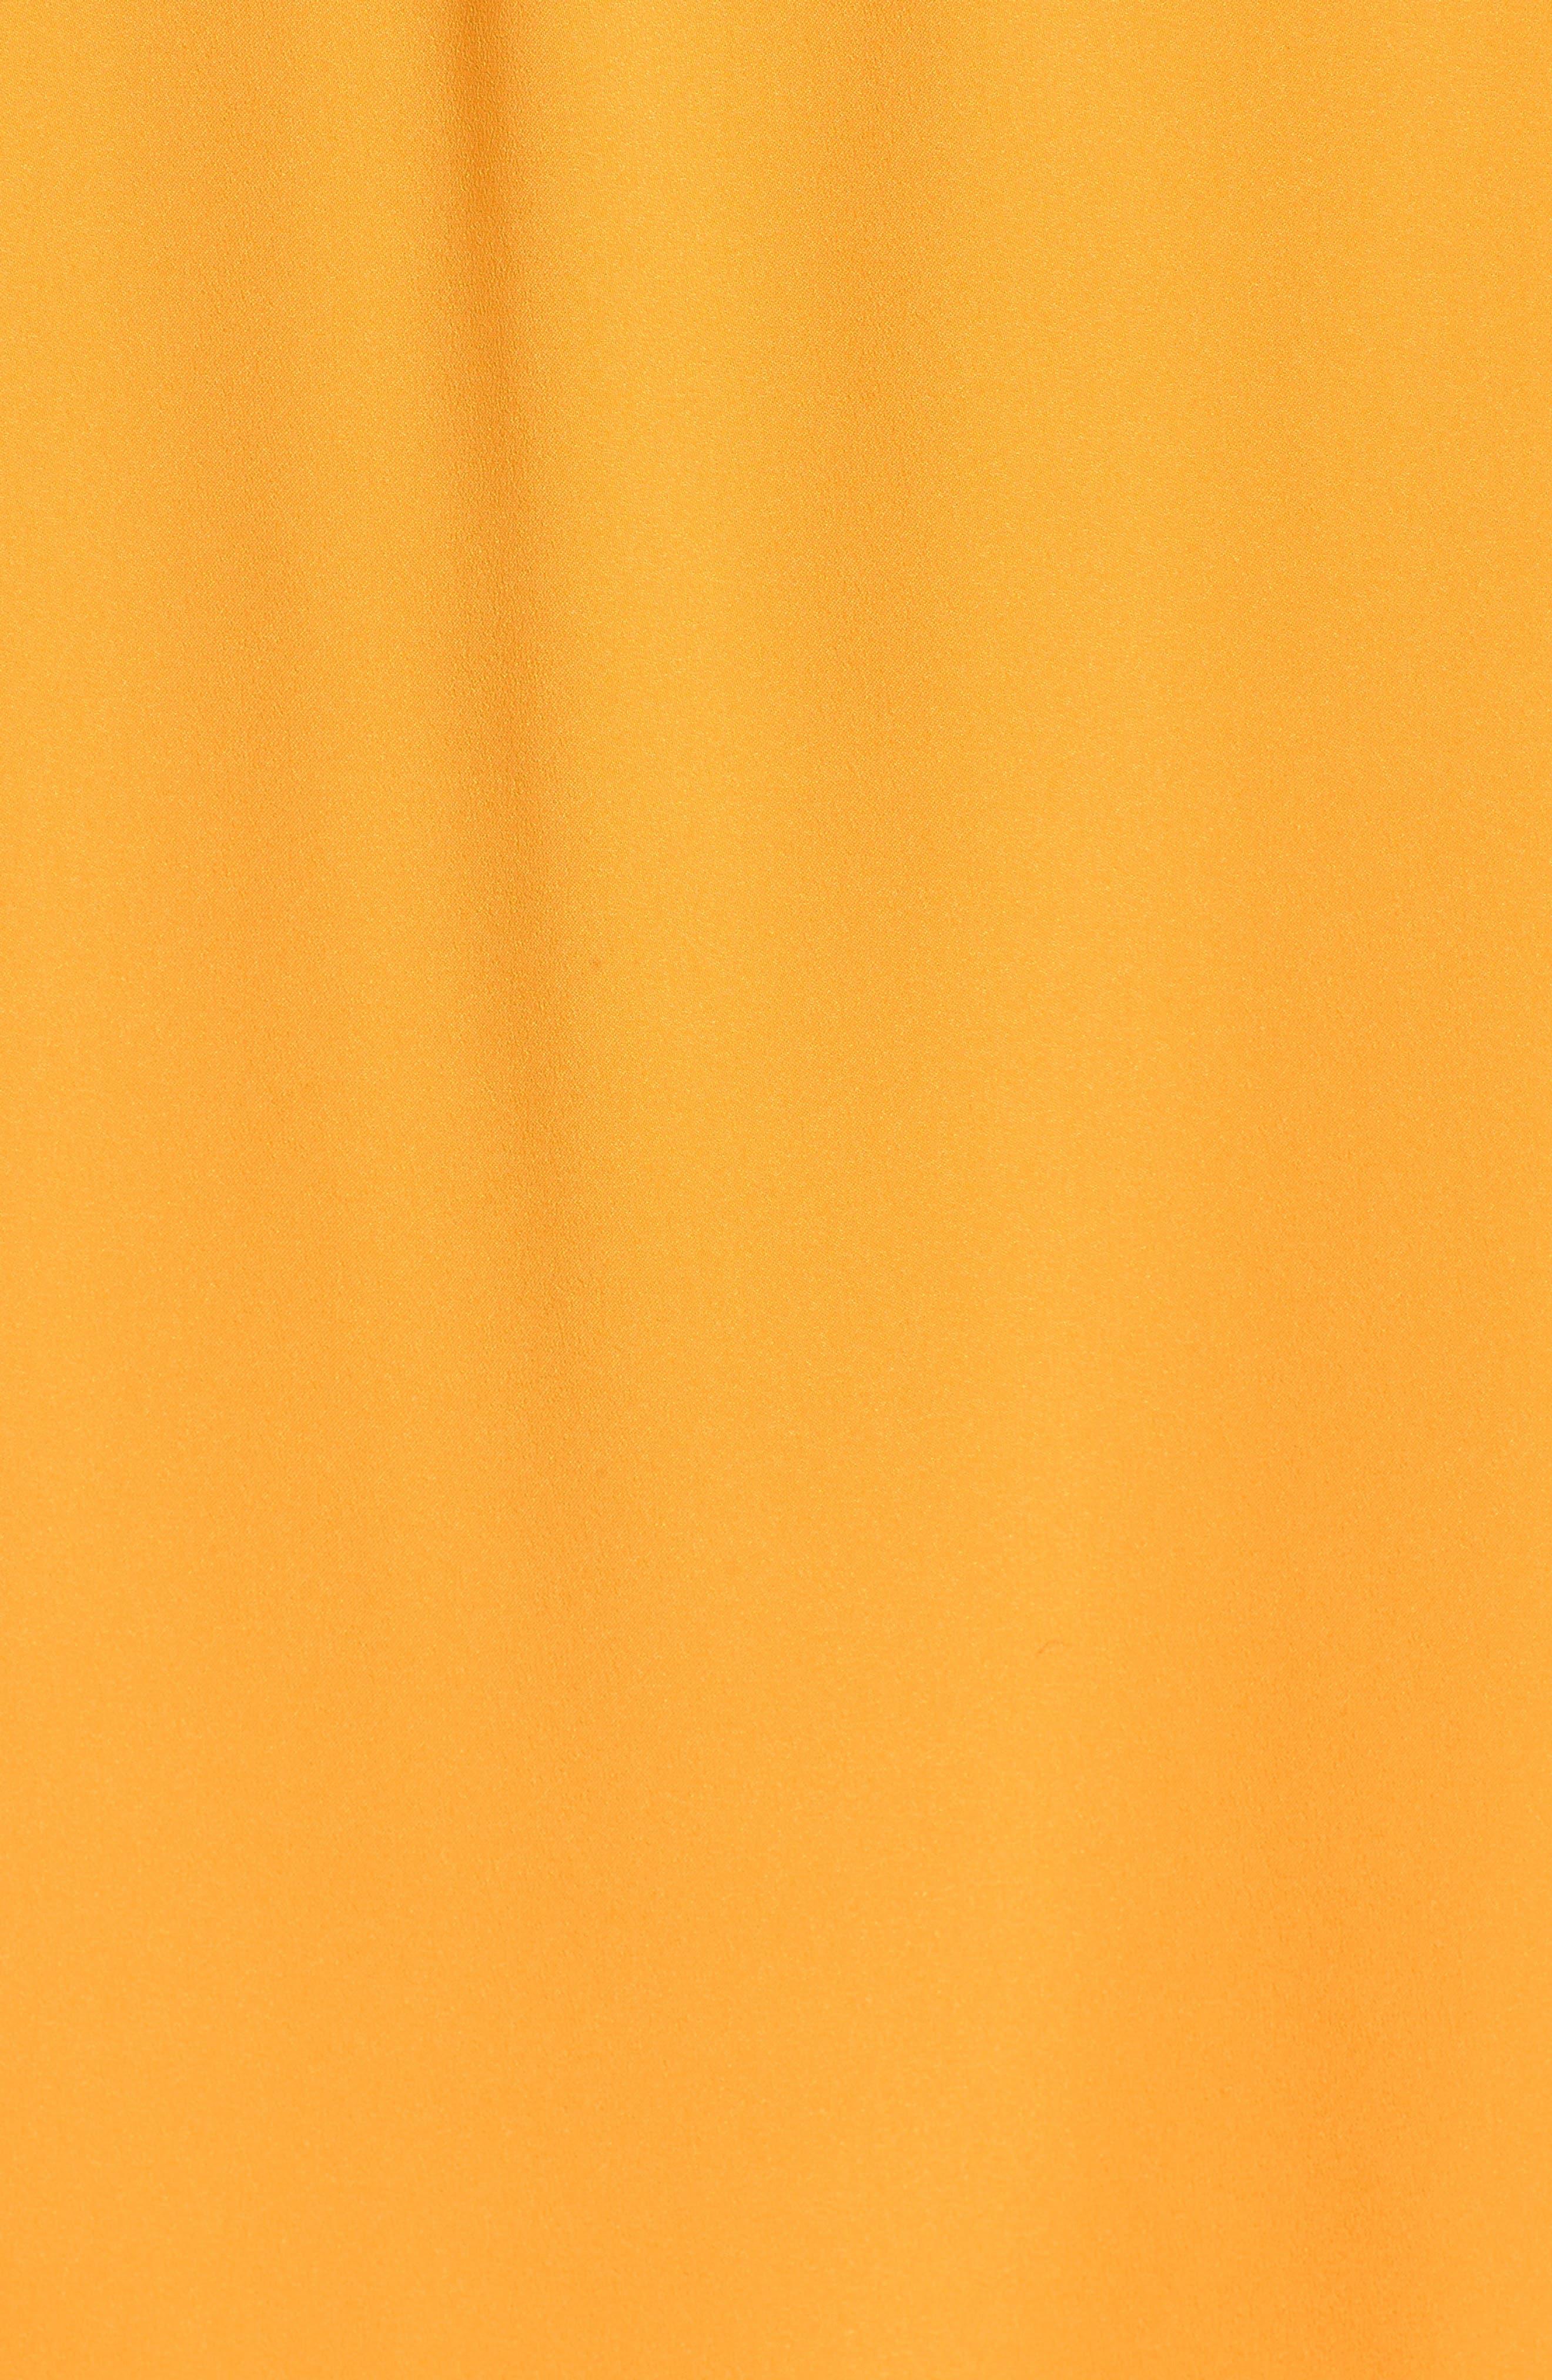 Off the Shoulder Crepe Dress,                             Alternate thumbnail 27, color,